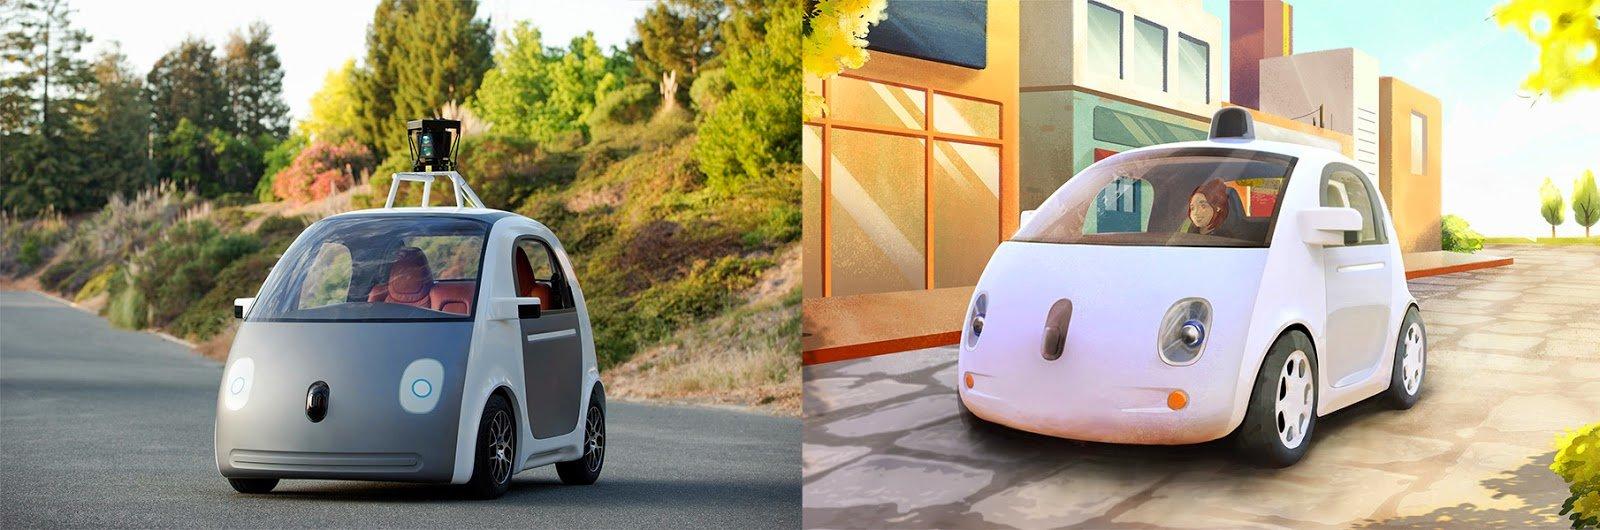 Prototyp des Self Driving Car von Google